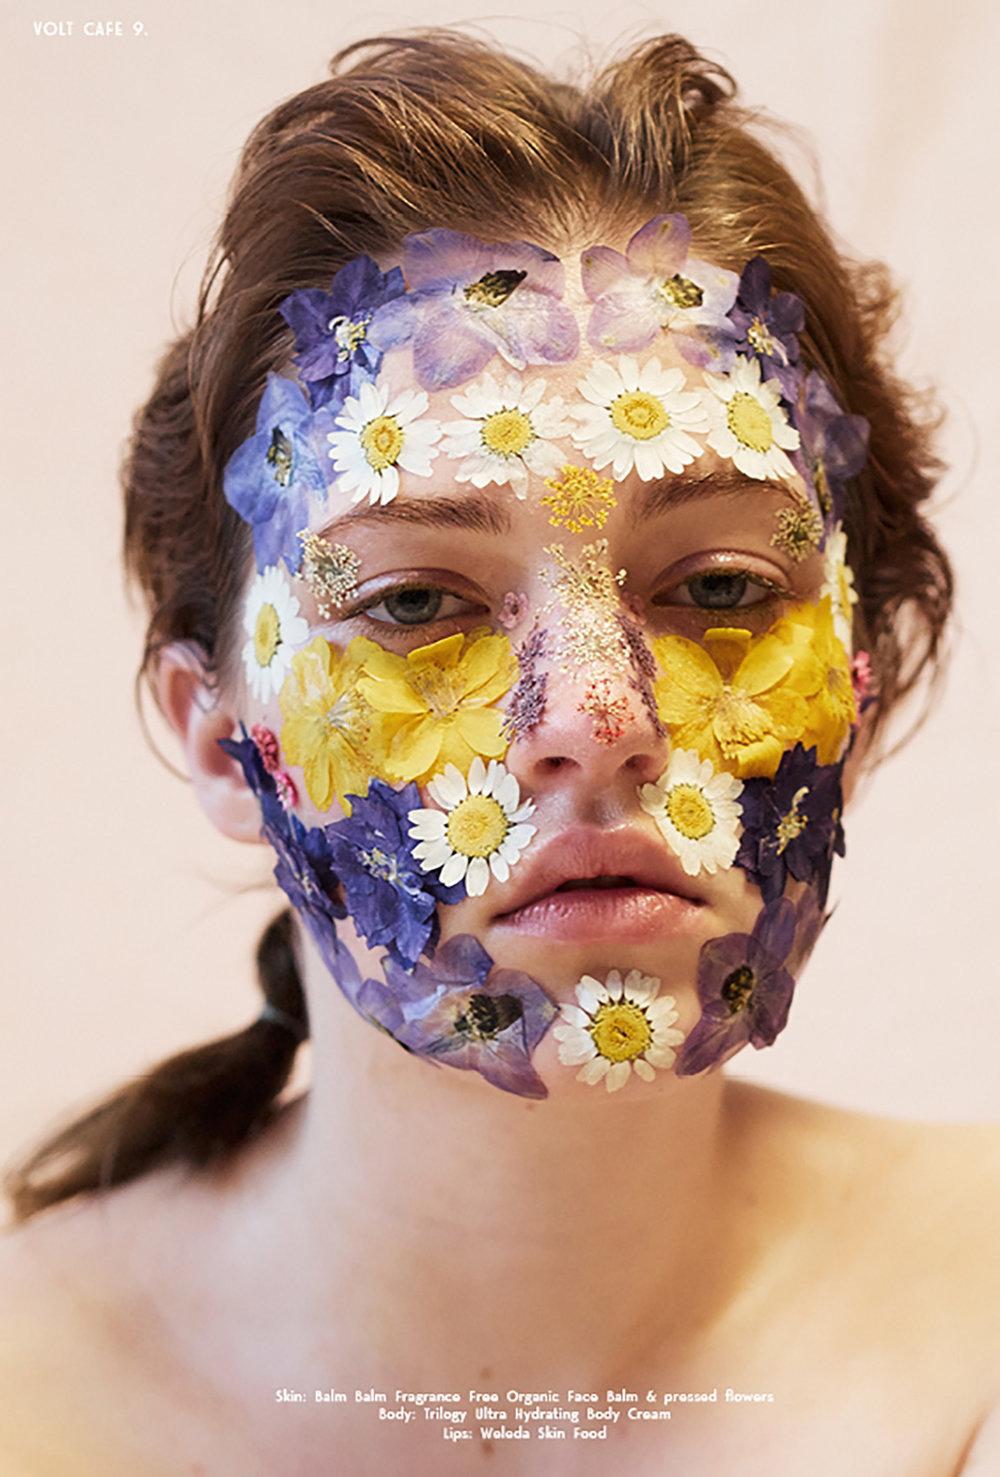 037-icon-artist-management-Kristin-Vicari-Beauty-Volt.jpg